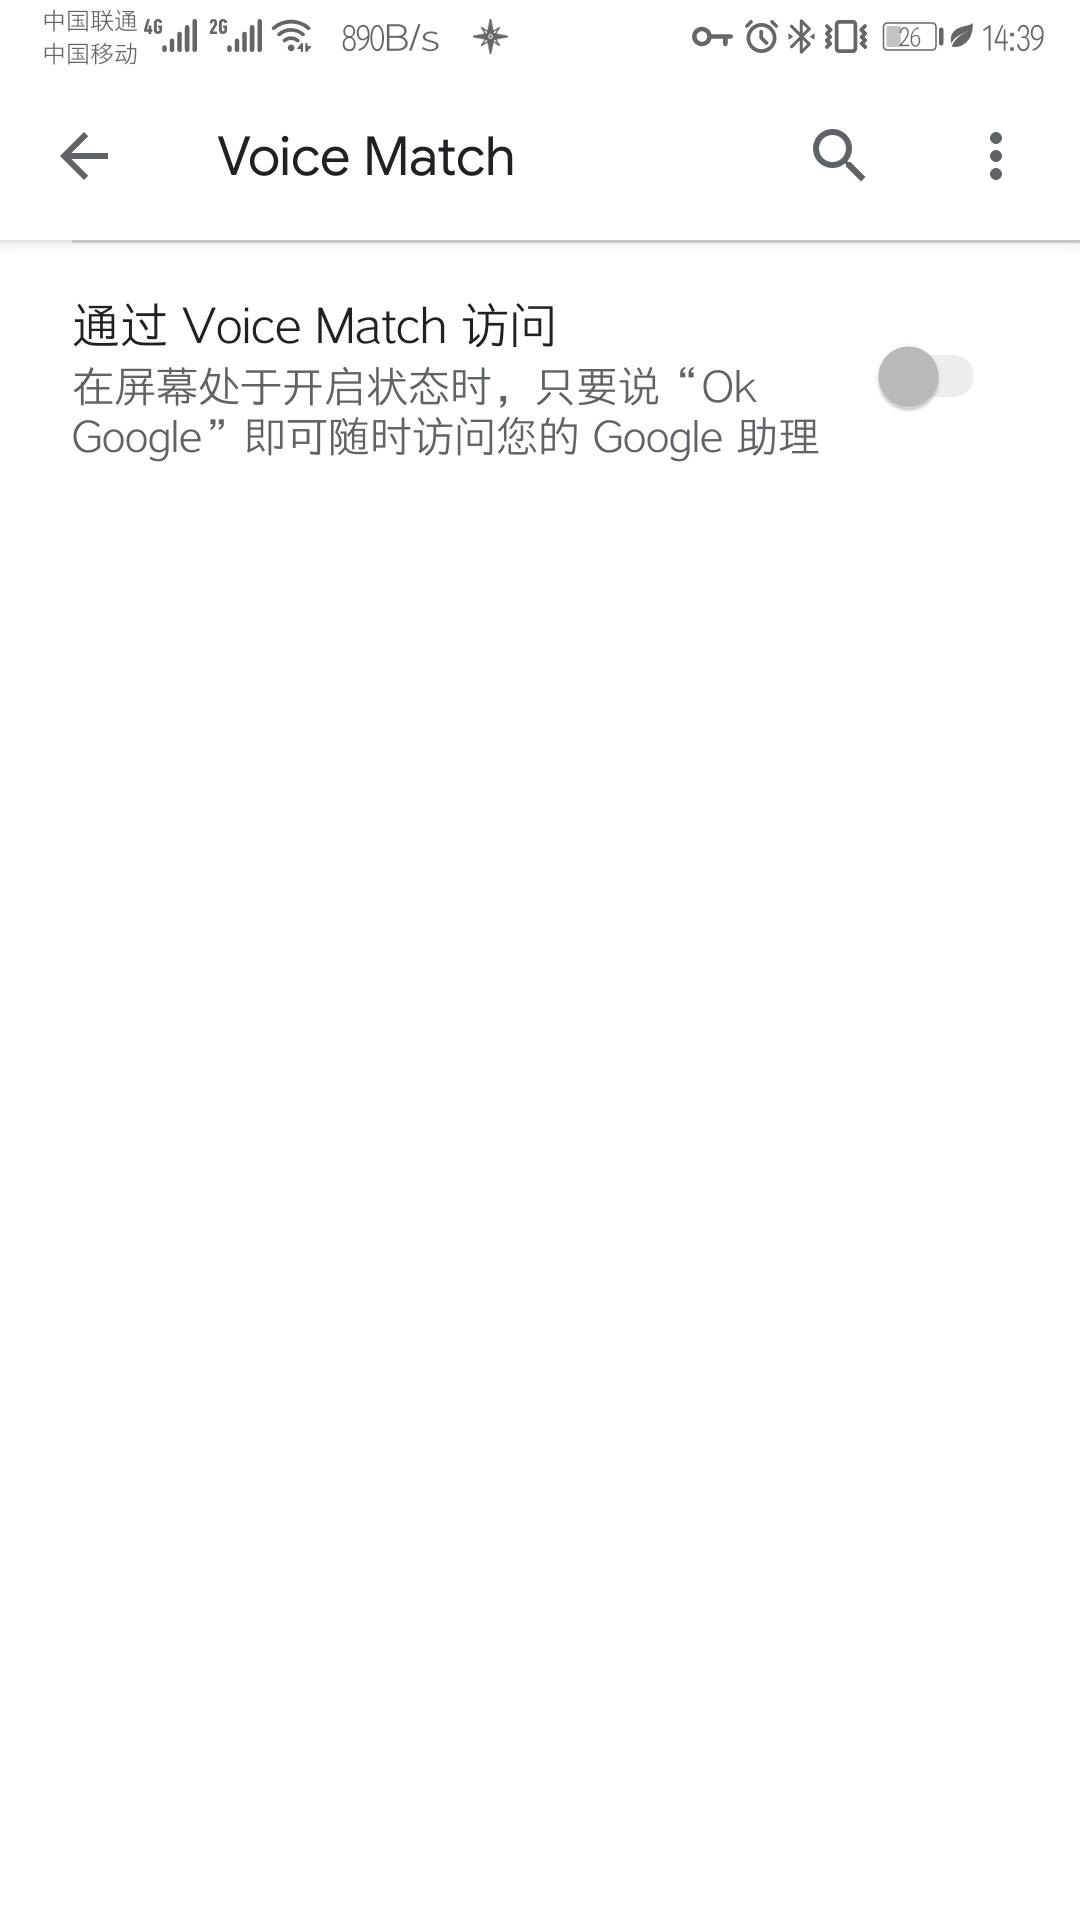 Screenshot_20190510_143927_com.google.android.goo.jpg